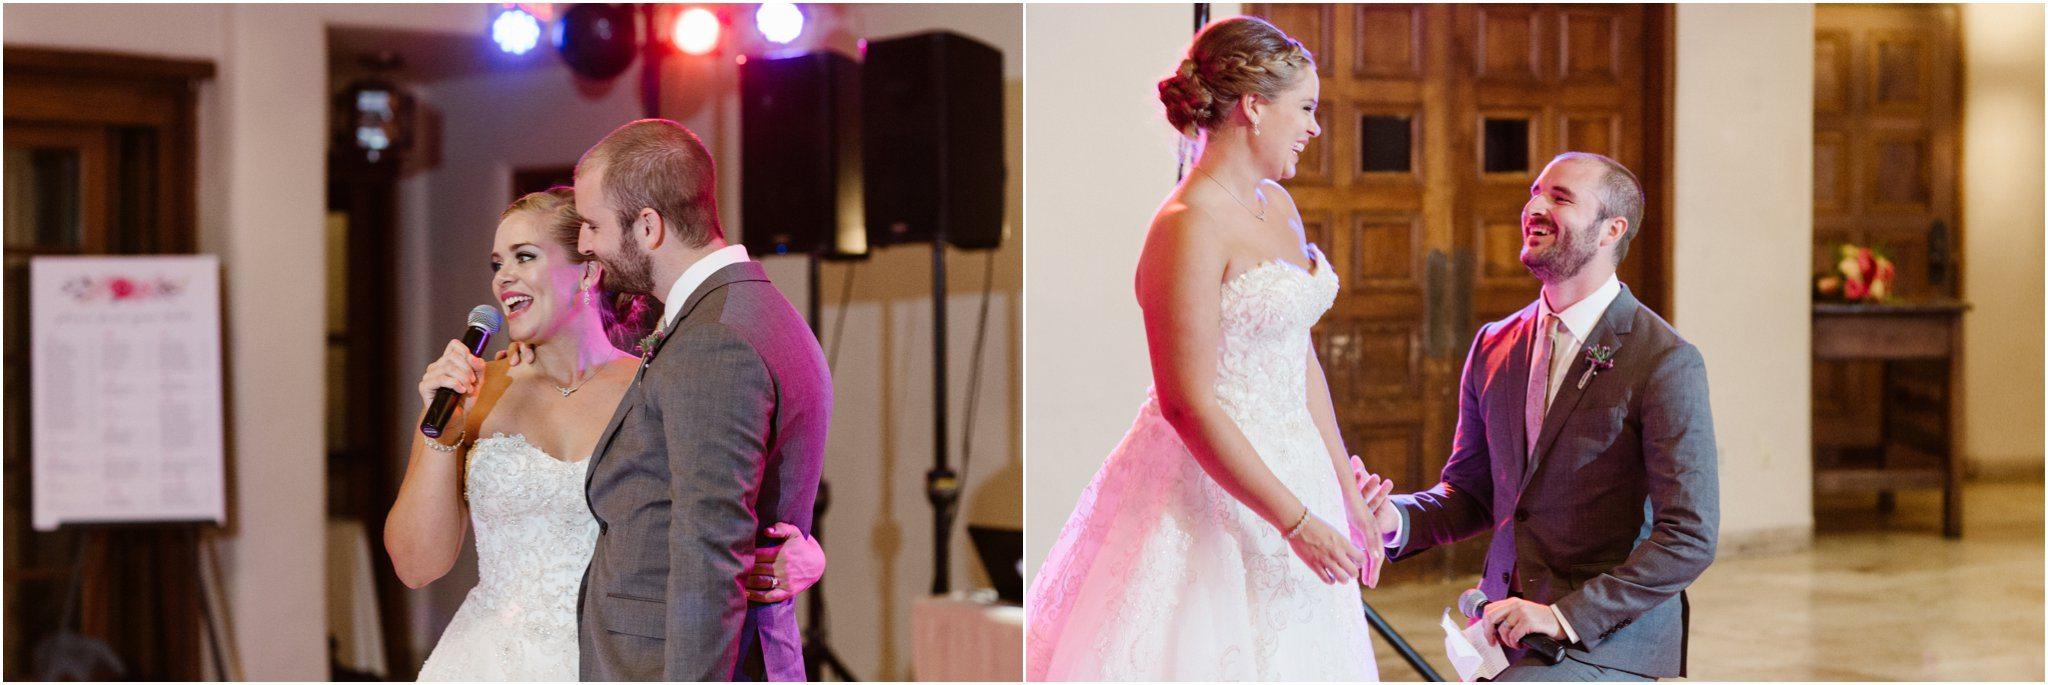 0081albuquerque-wedding-photographer_-santa-fe-wedding-photographer_-southwest-wedding-photography_-blue-rose-studio